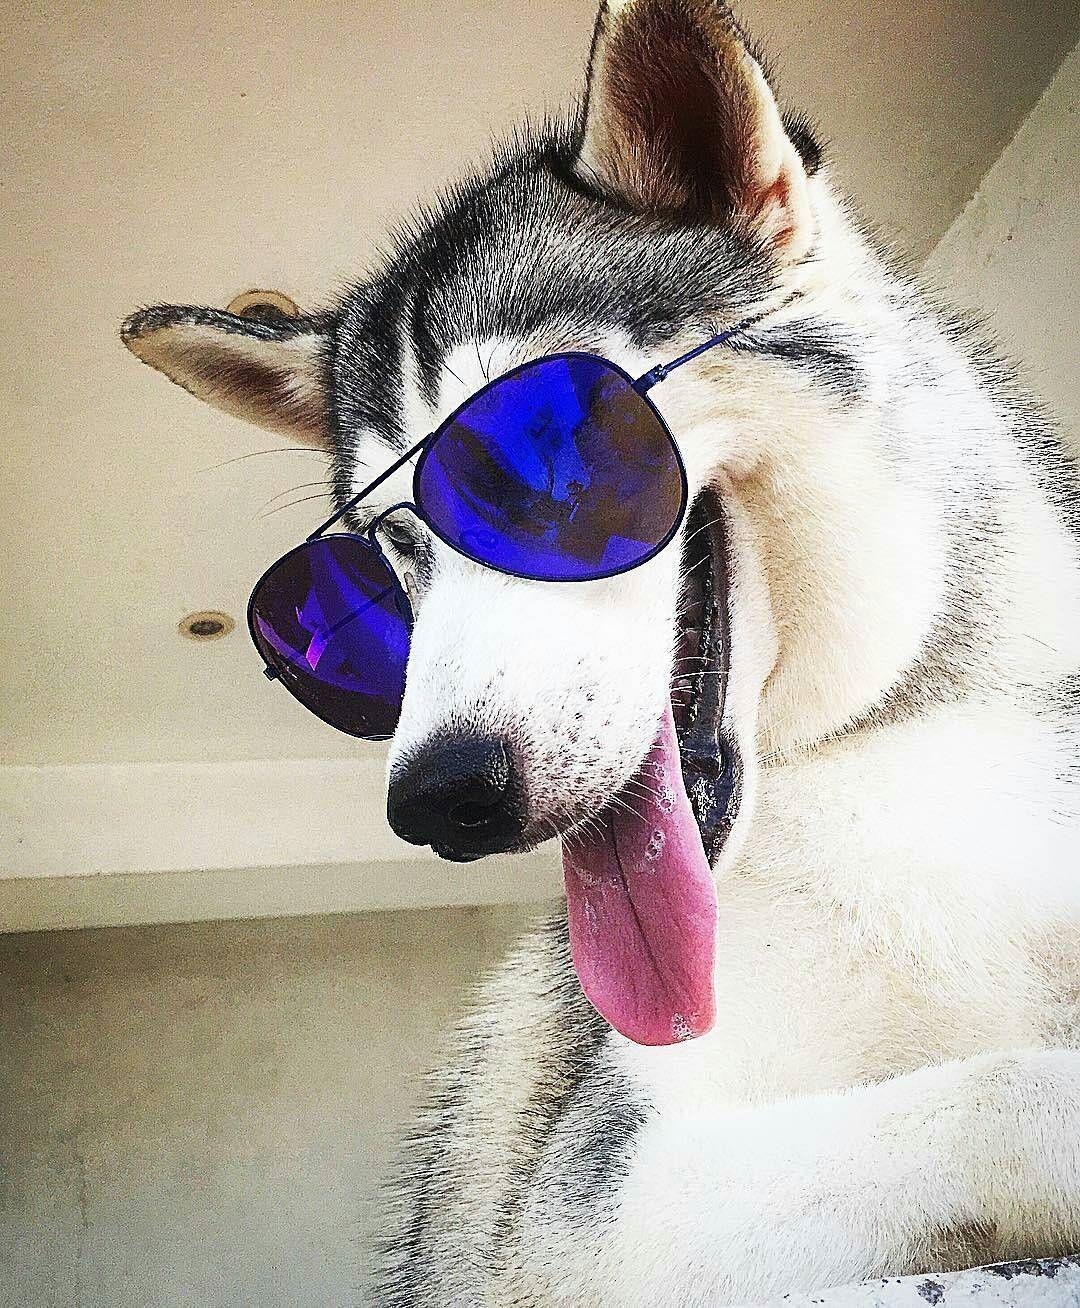 34b1d27e964 Pin by GitanaYoSoy on Siberian Huskies. My true passion ! | Dogs ...